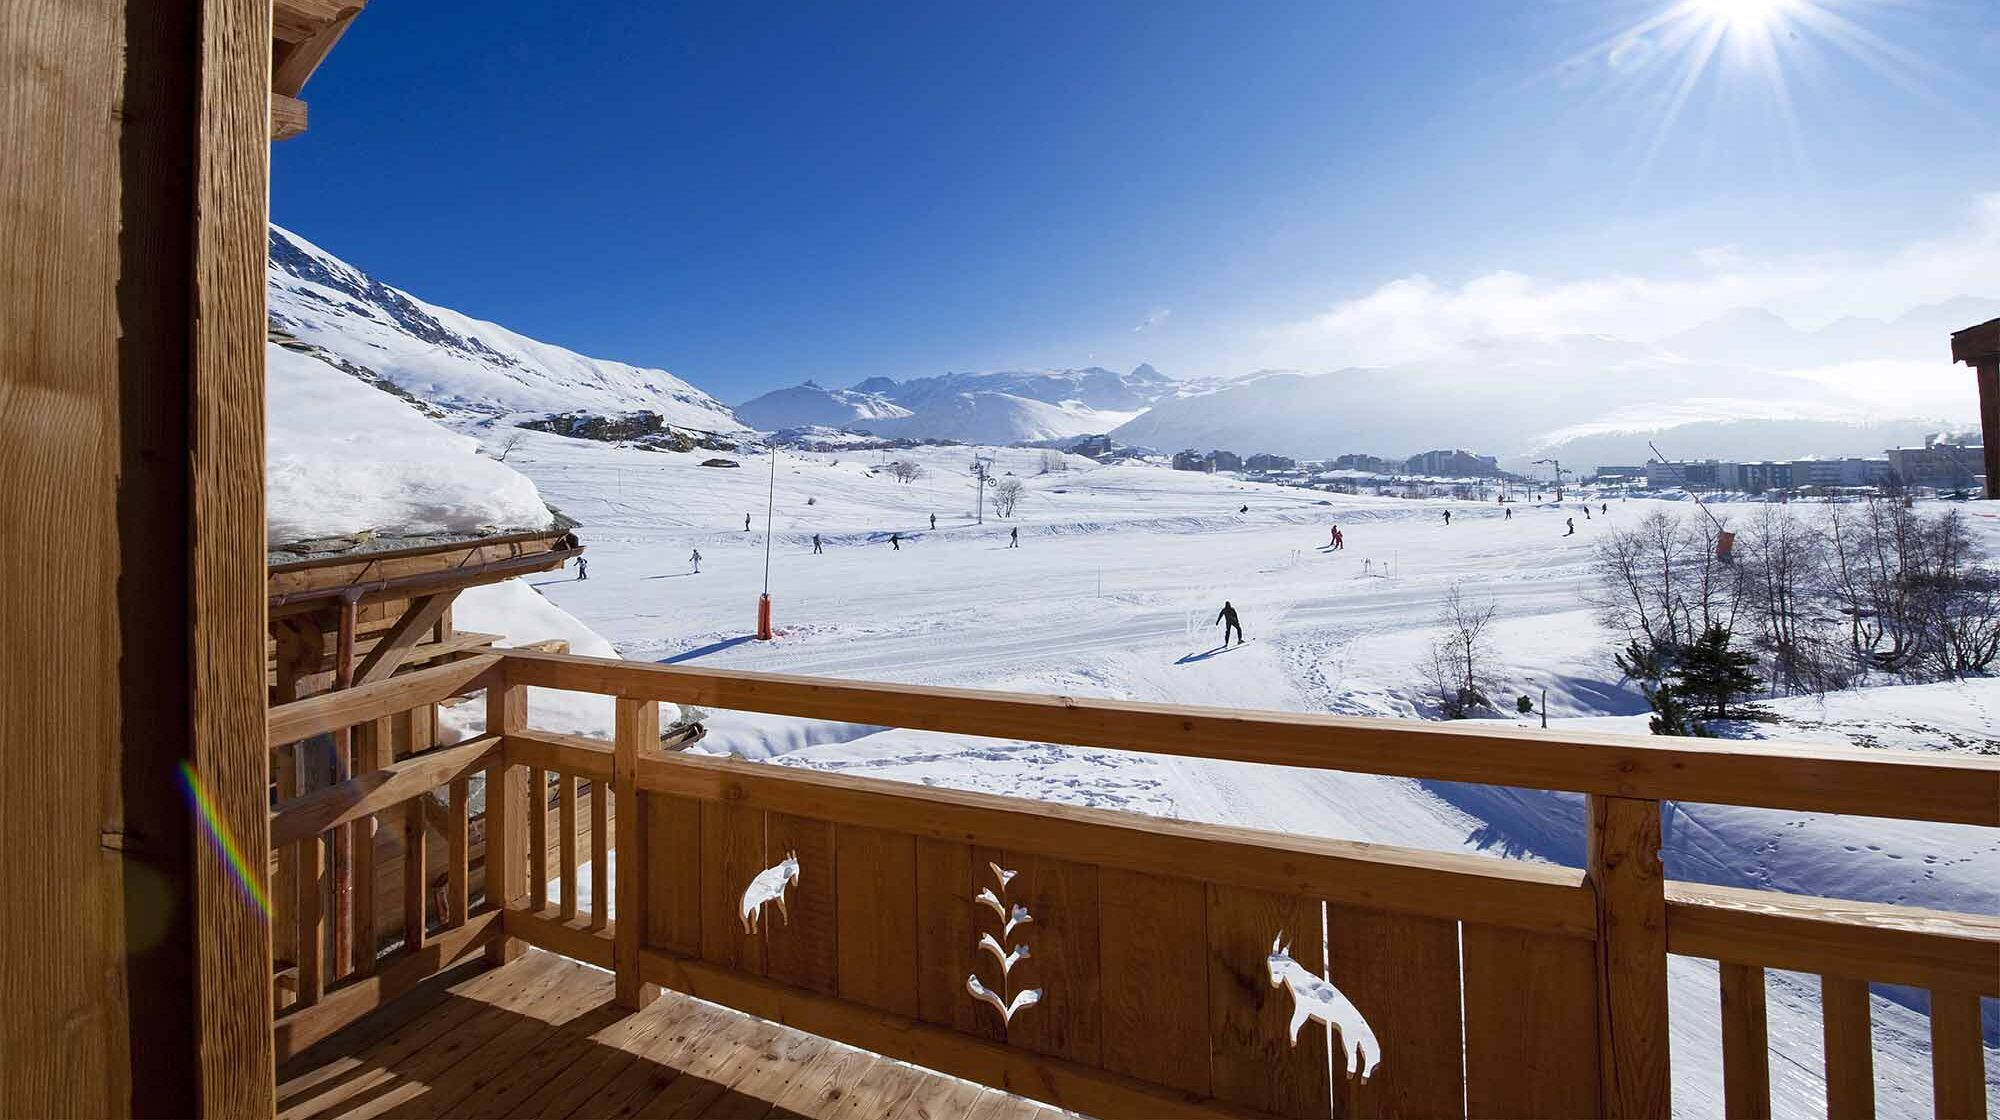 Chalet La Ferme - Ski France Premium